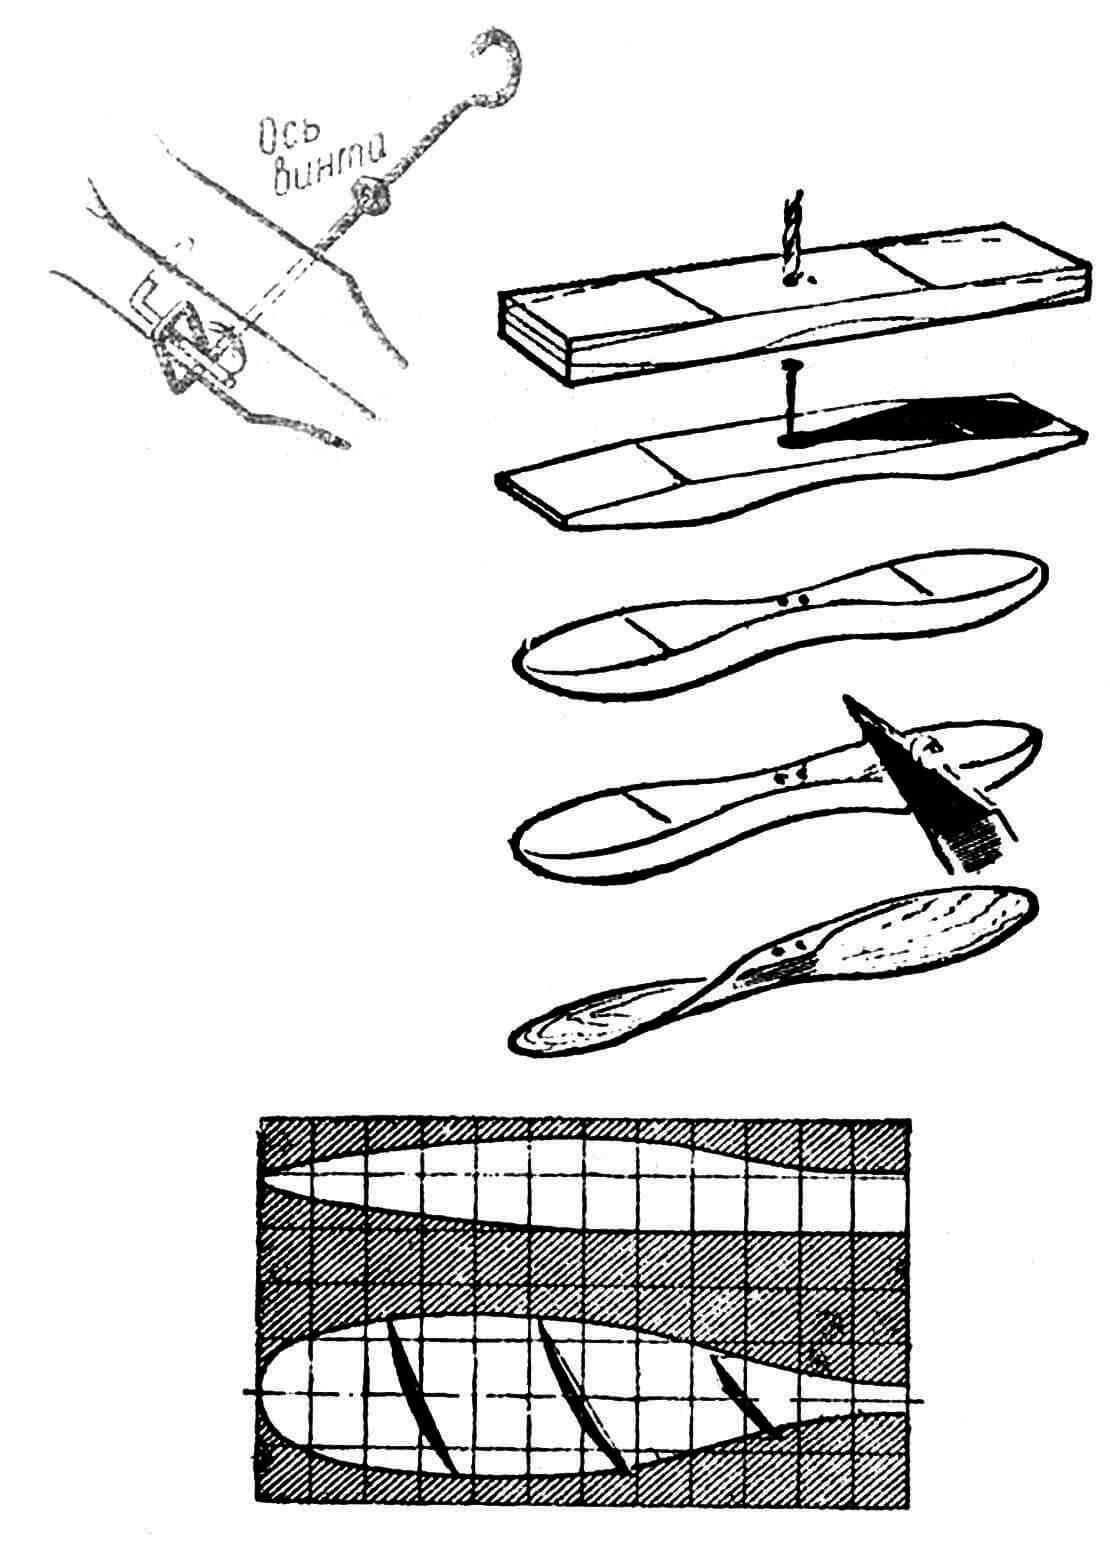 Рис. 9. Шаблоны и процес изготовления винта.